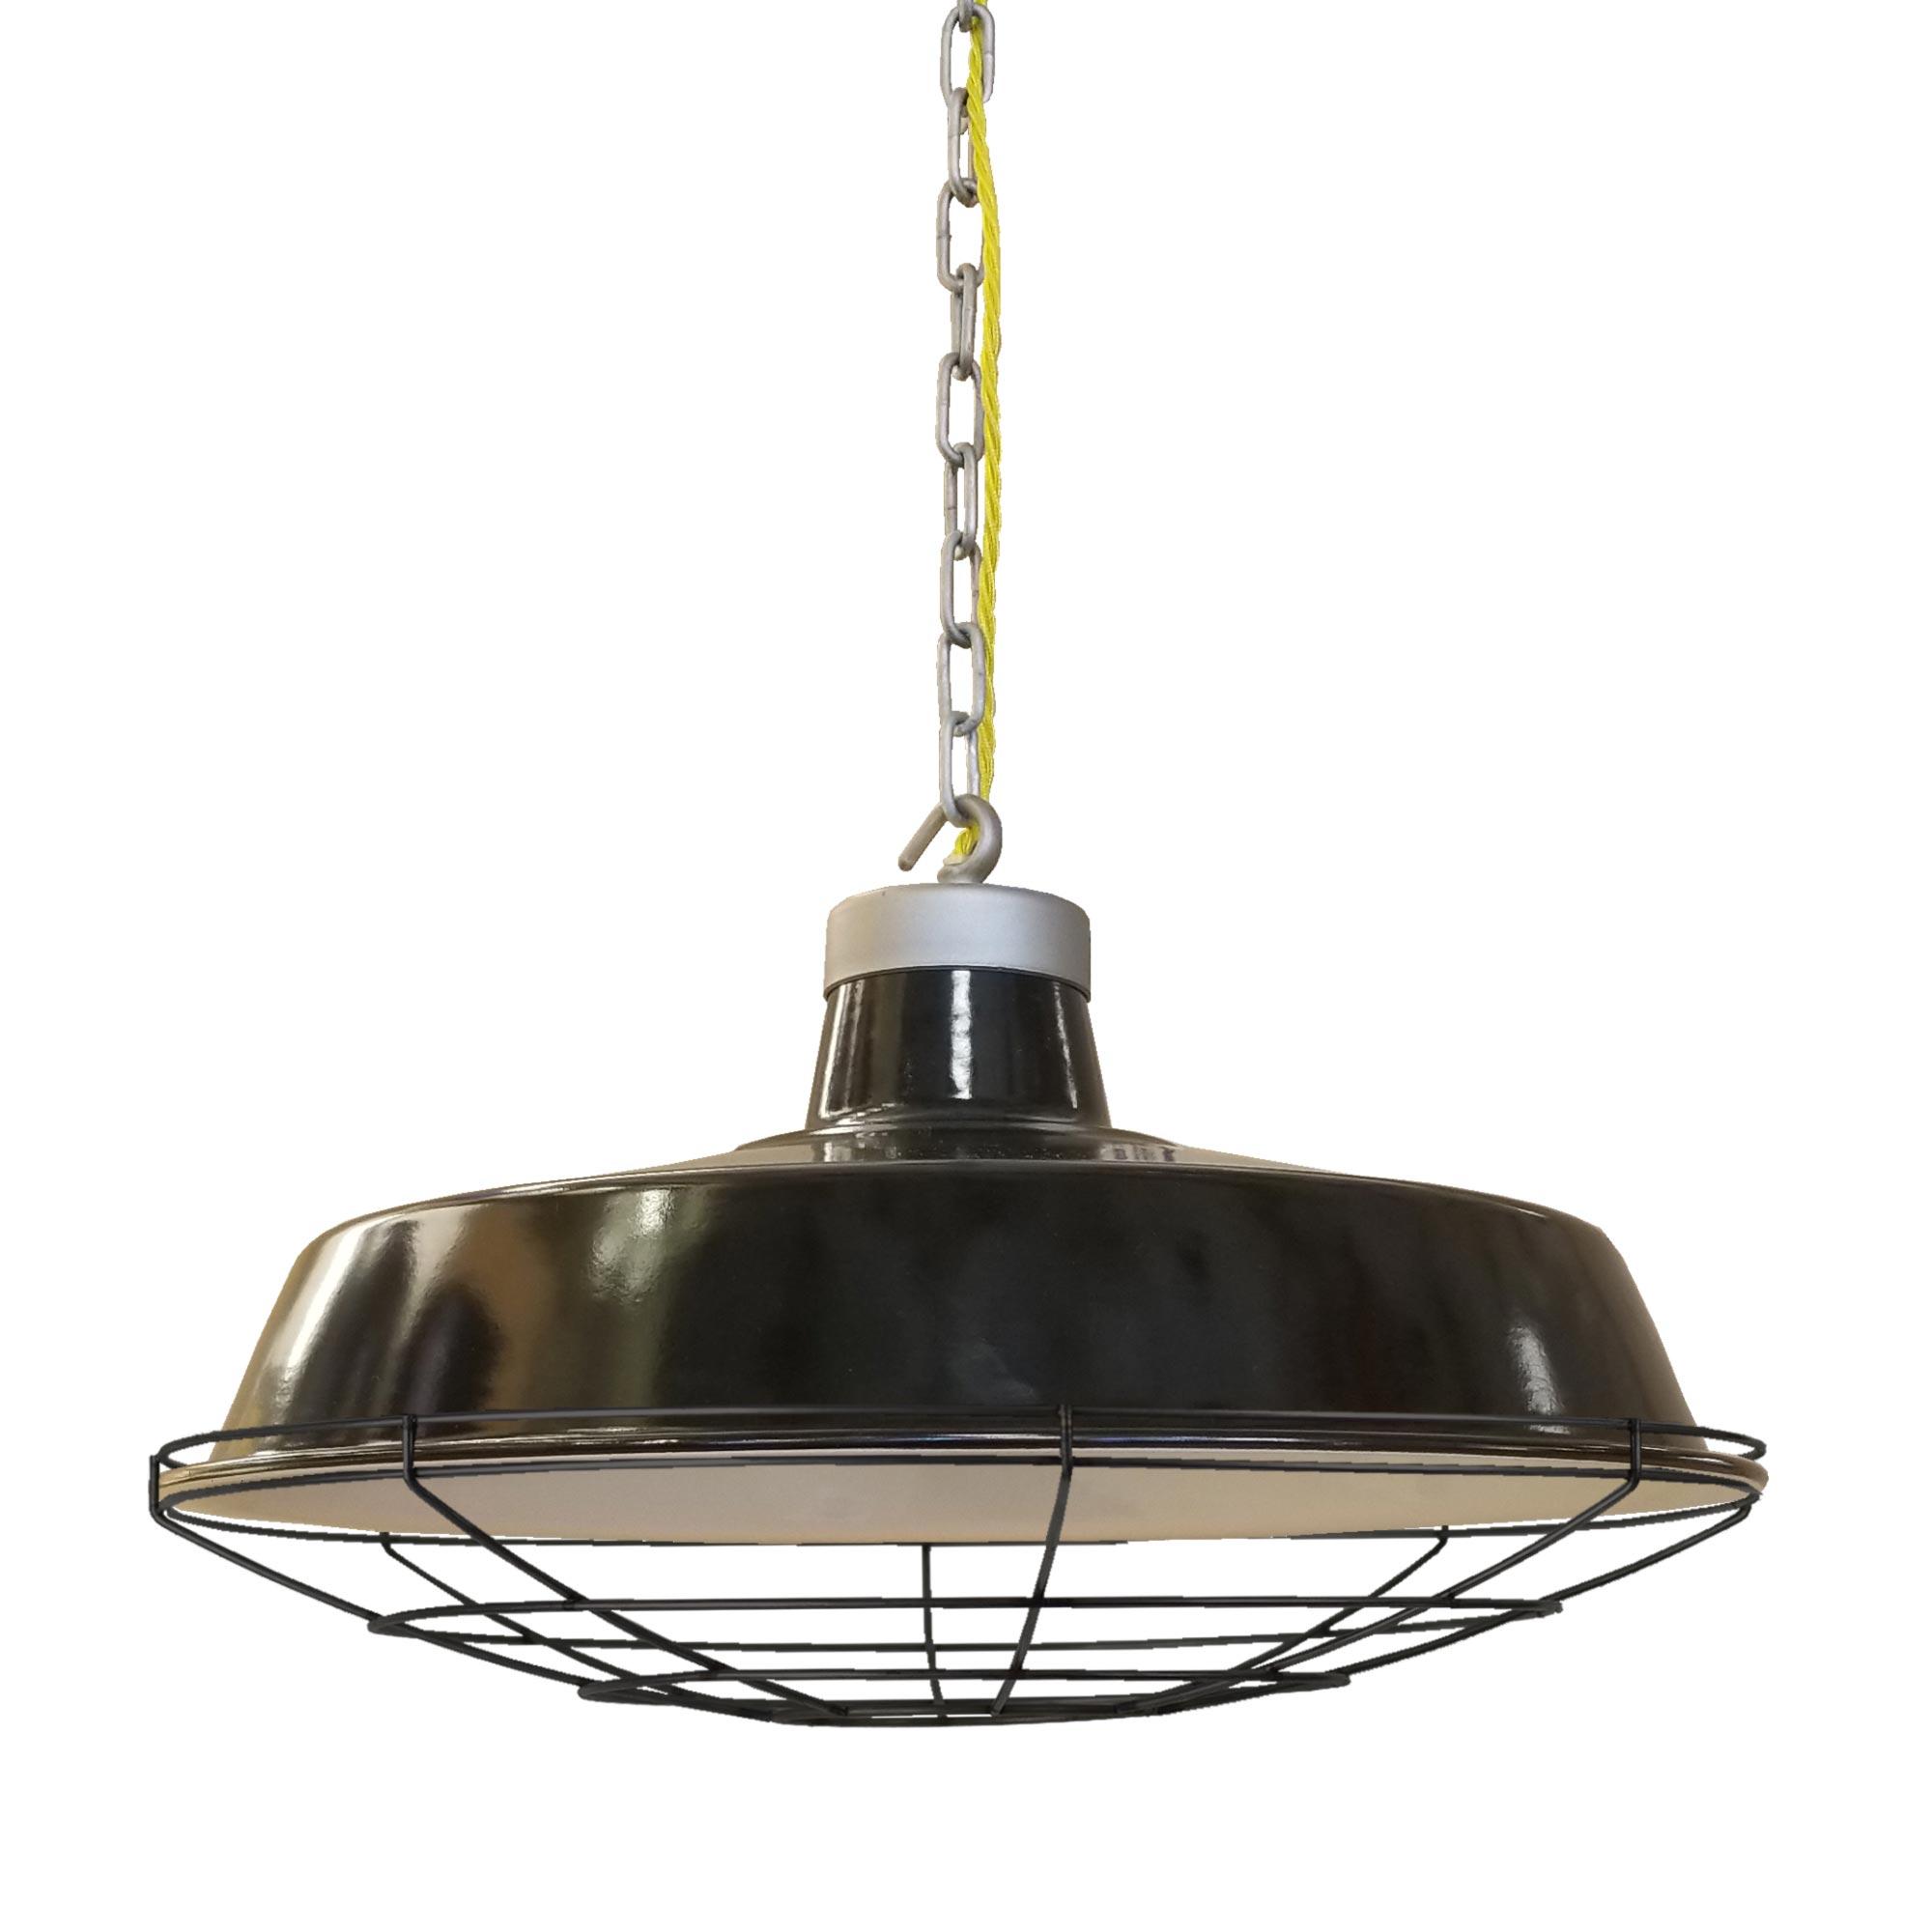 Industrial Enamel Pendant Light E2 Contract Lighting Uk